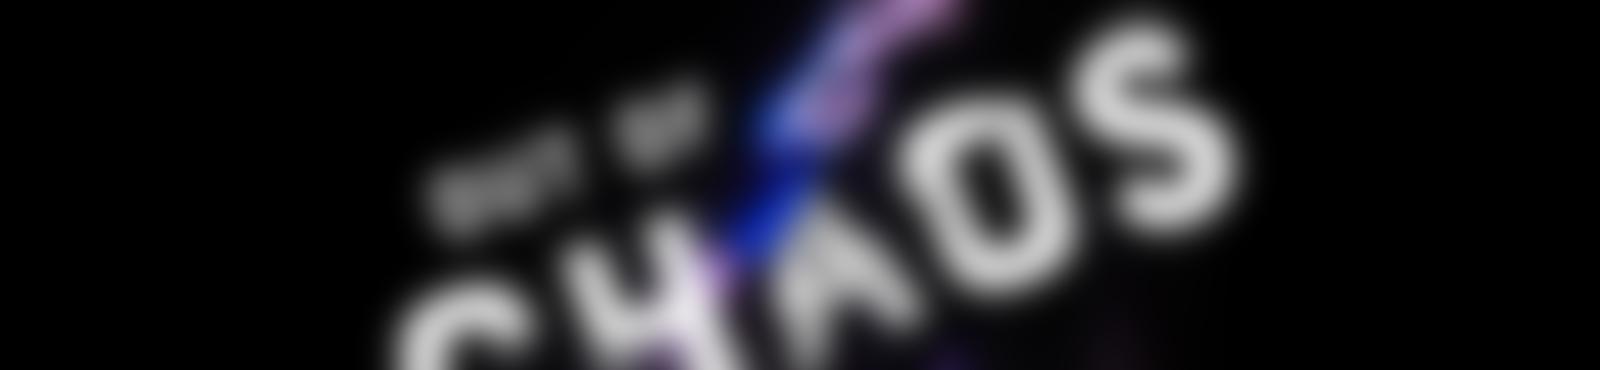 Blurred f34305f8 684b 40a0 8532 ae900196fbb3